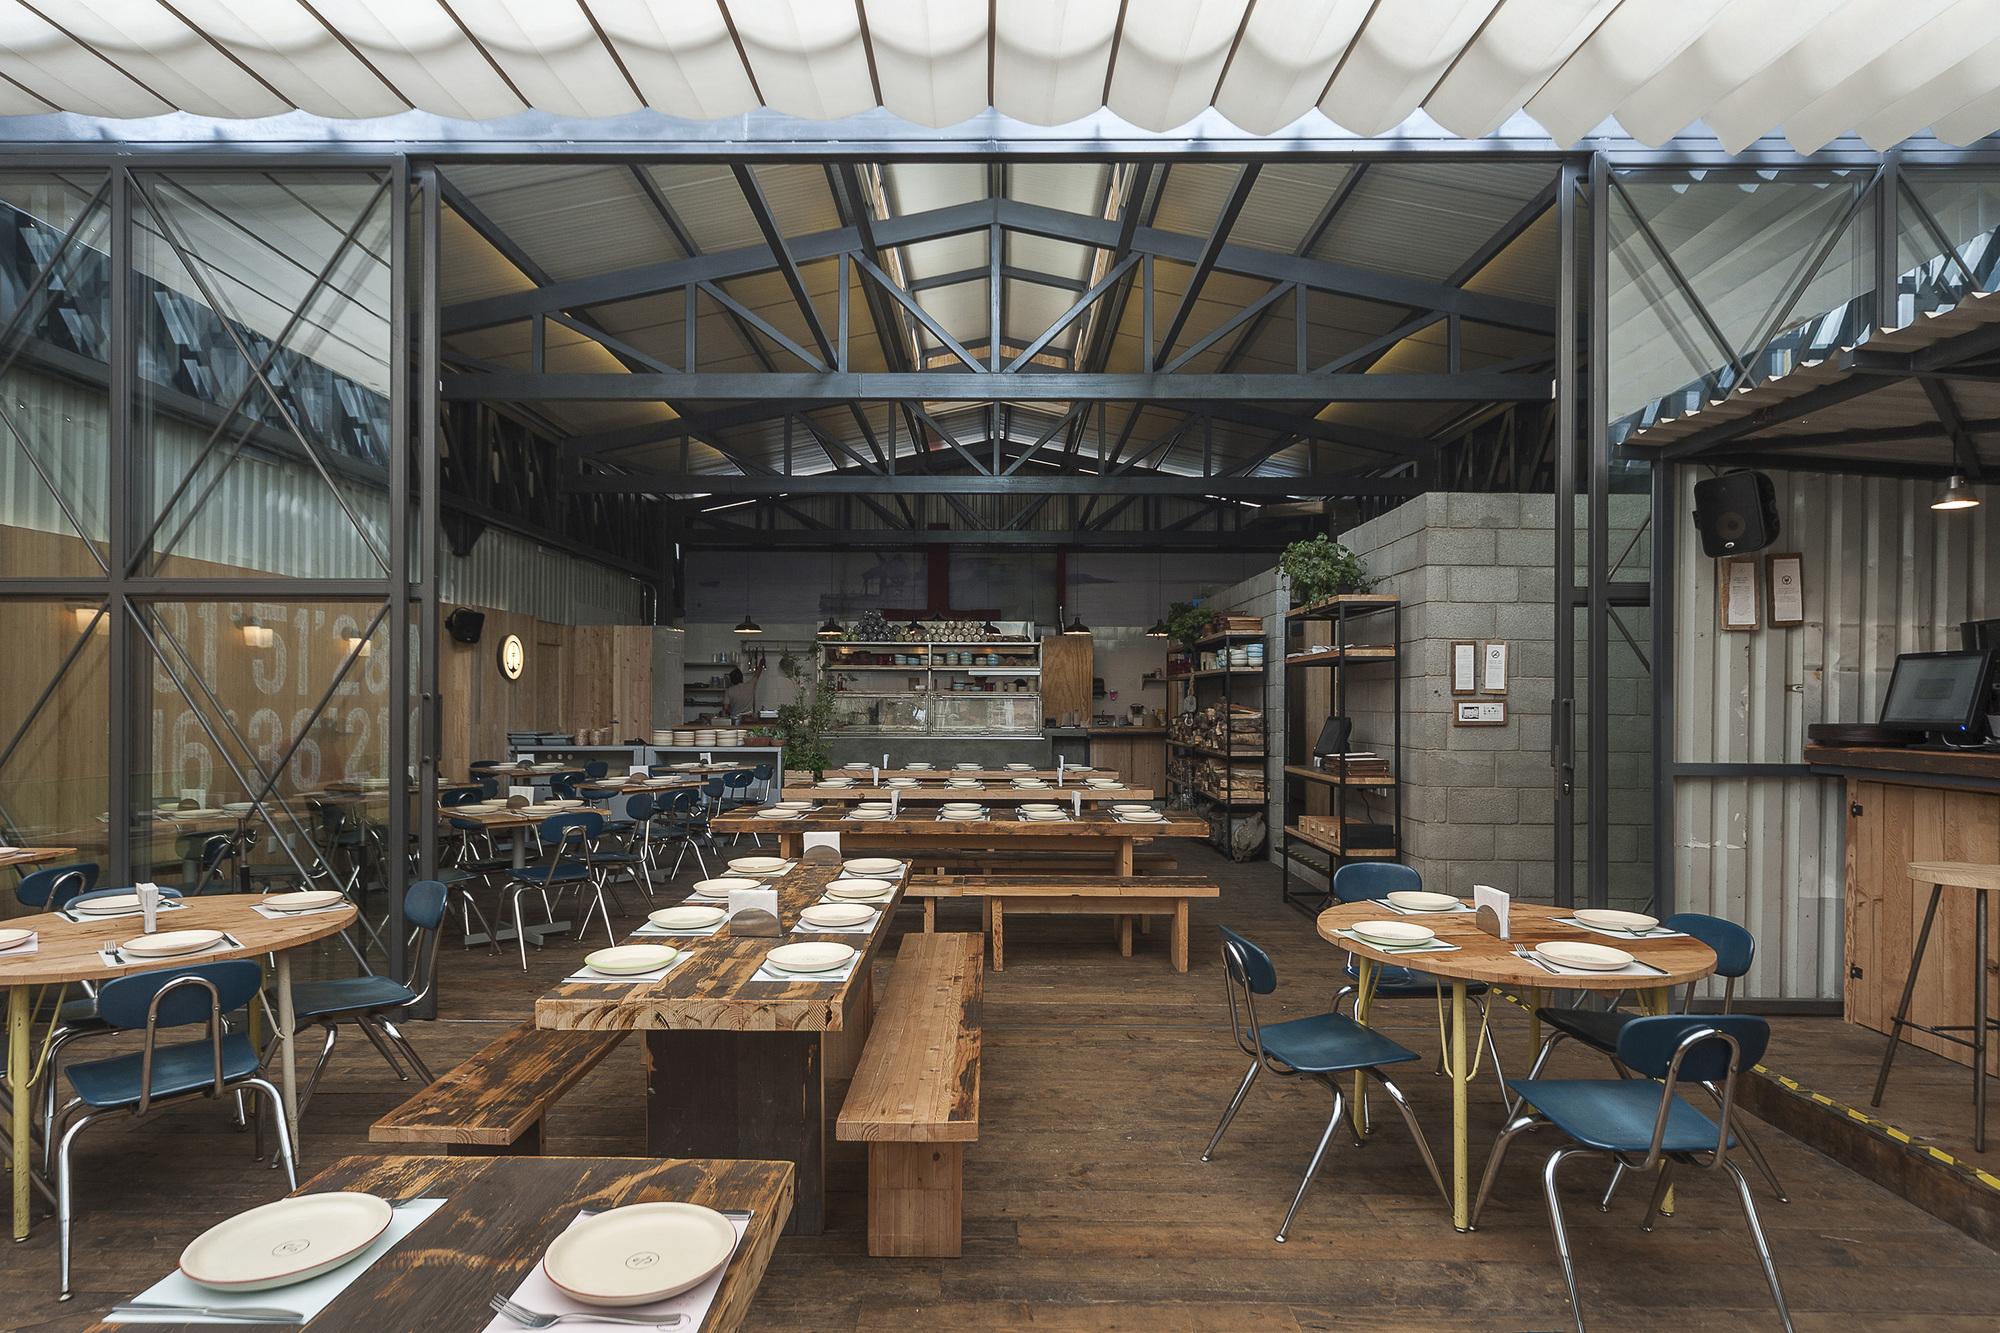 Campobaja estudio atemporal archdaily for Utensilios para restaurantes